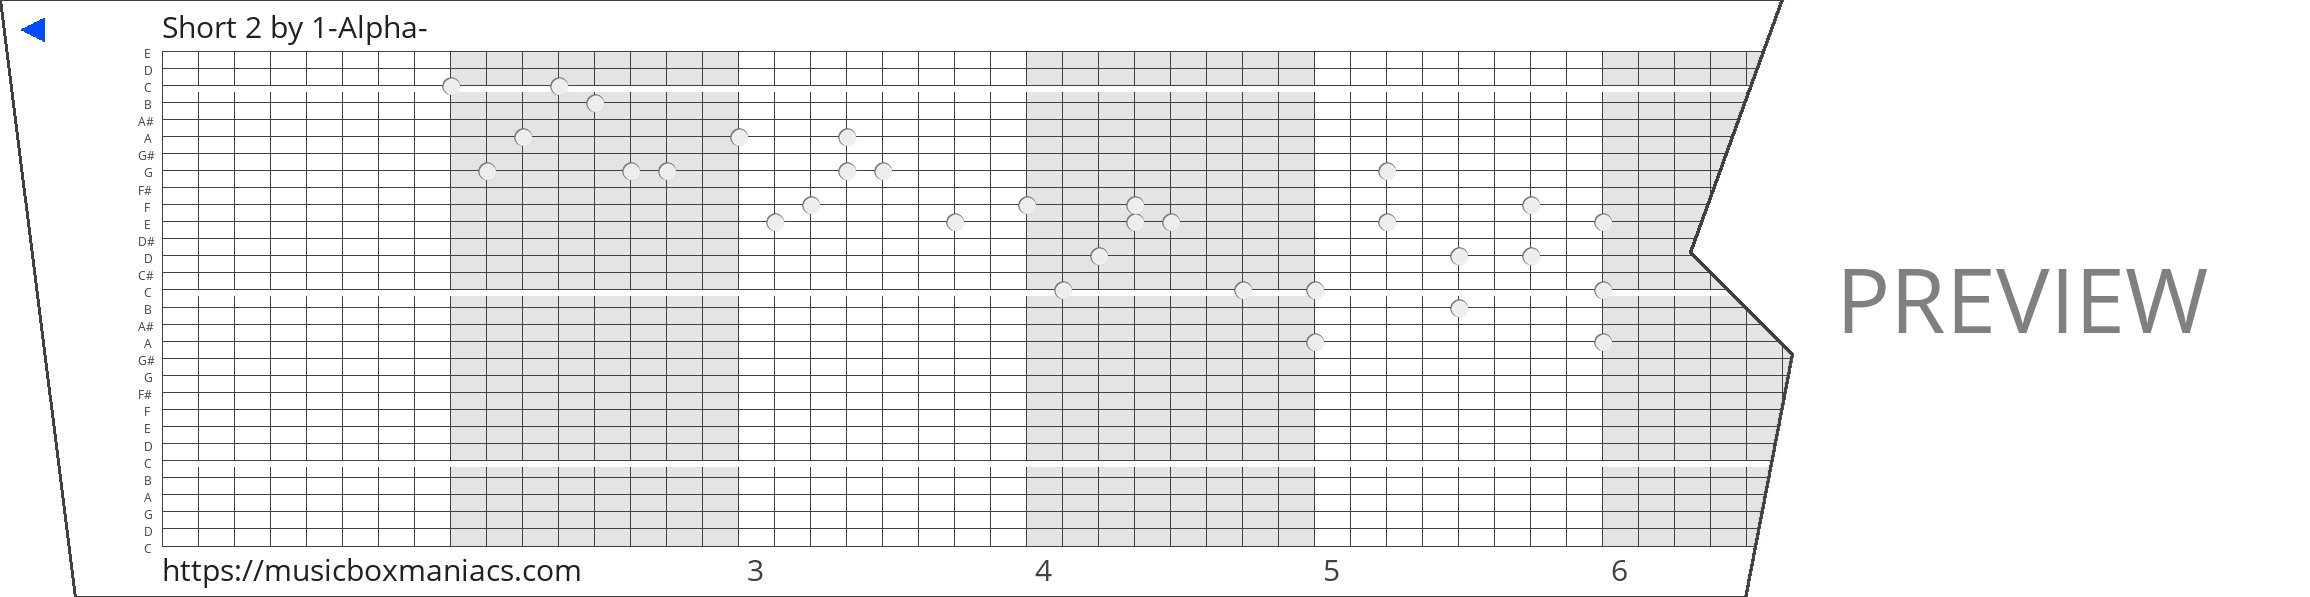 Short 2 30 note music box paper strip